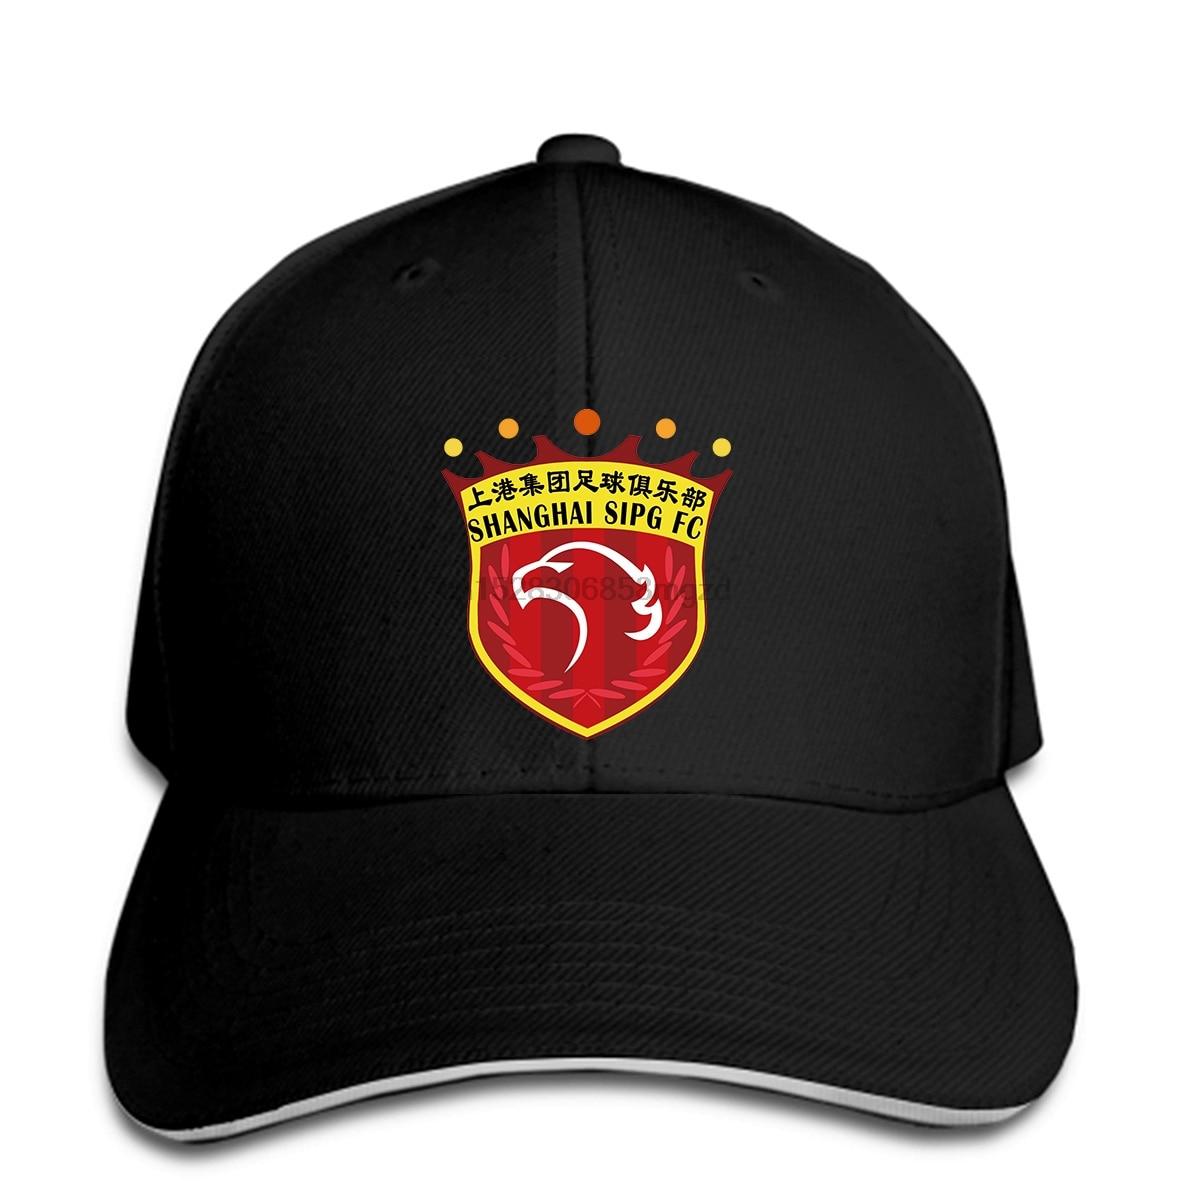 Shanghai Sipg F.c. Football Club Chinese Super League Soccer Team Men Baseball Cap Snapback Cap Women Hat Peaked